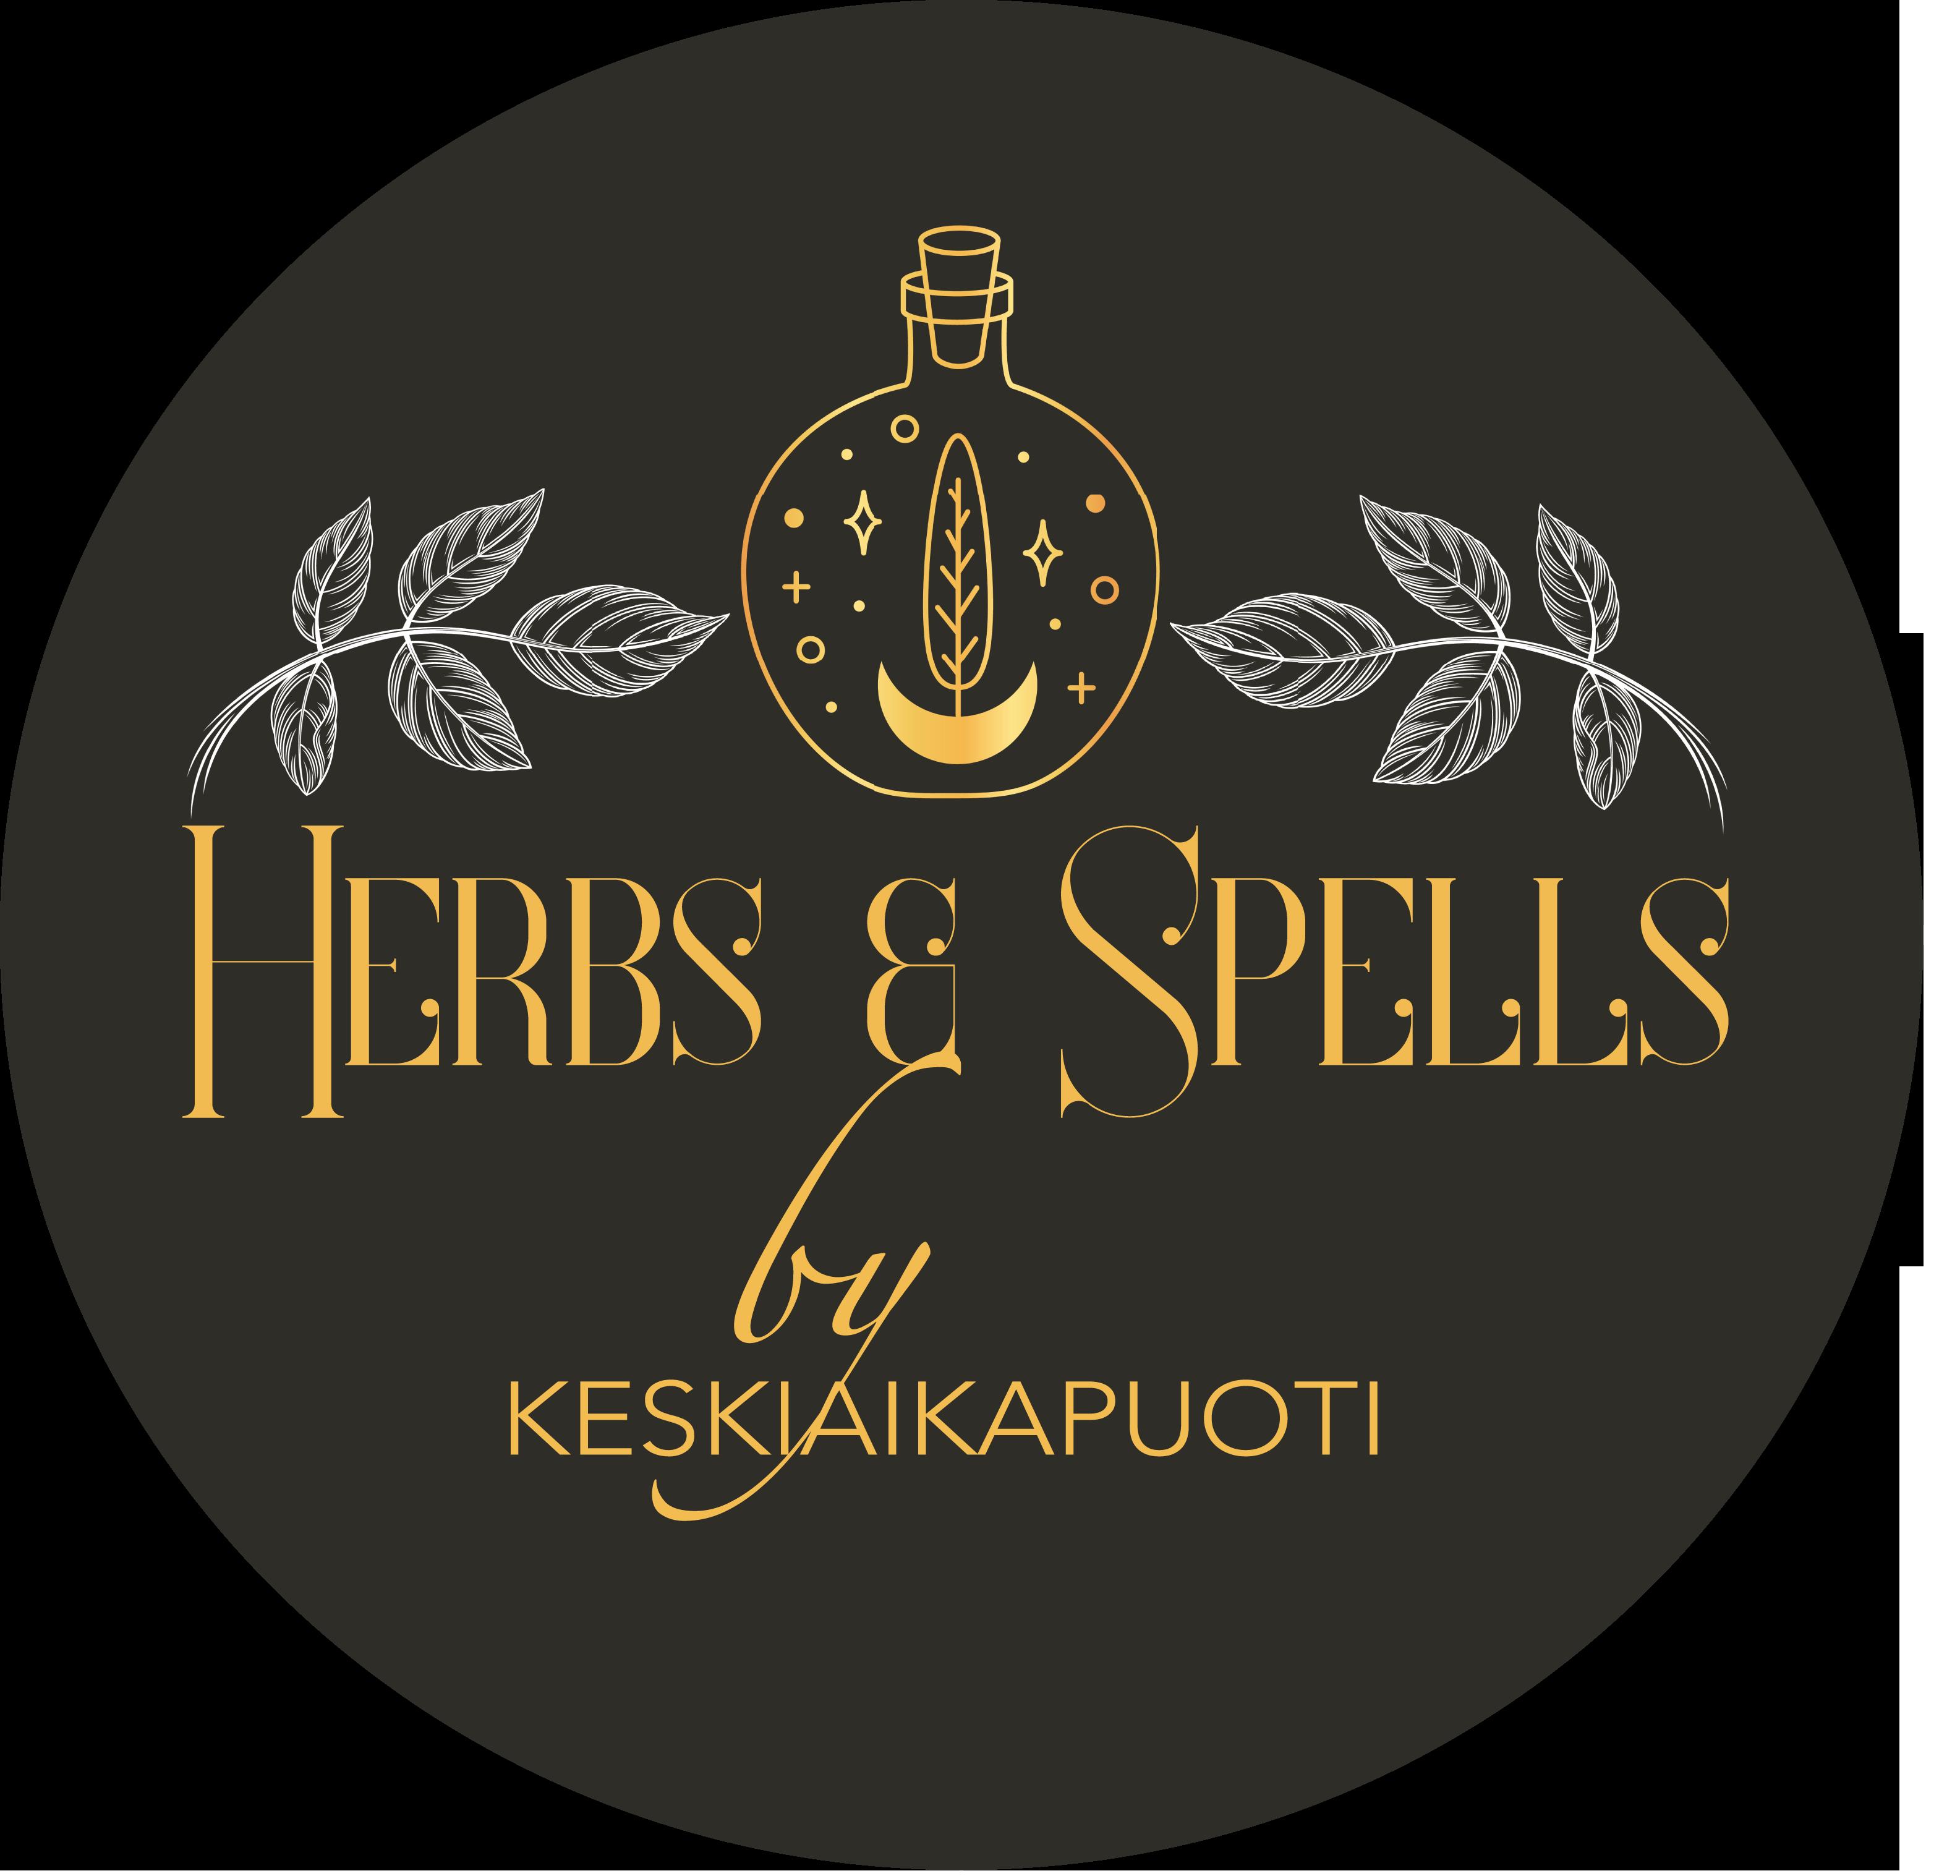 Korpin uni - suitsuke (Herbs&Spell by keskiaikapuoti)